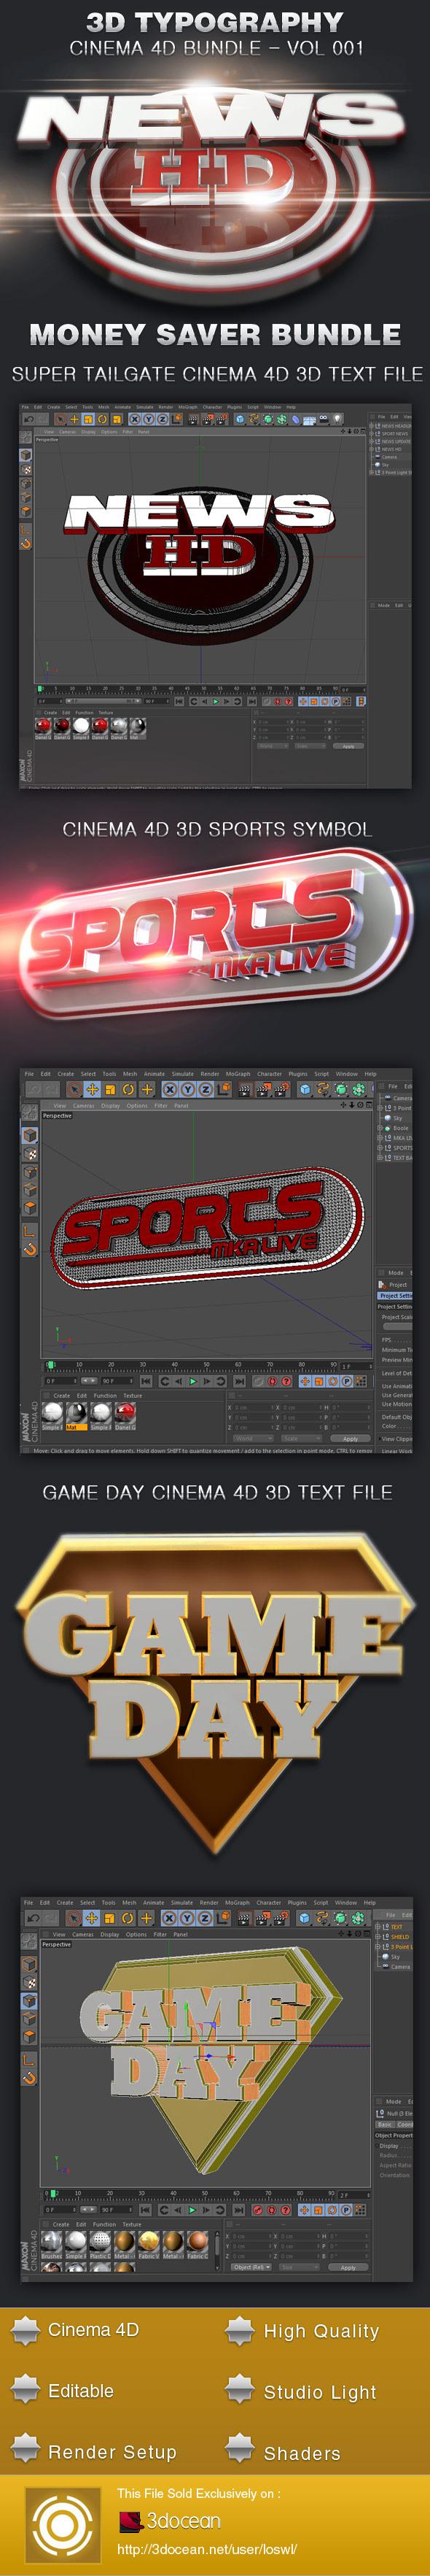 3D Typography Cinema 4D Bundle-Vol 002 - 3DOcean Item for Sale